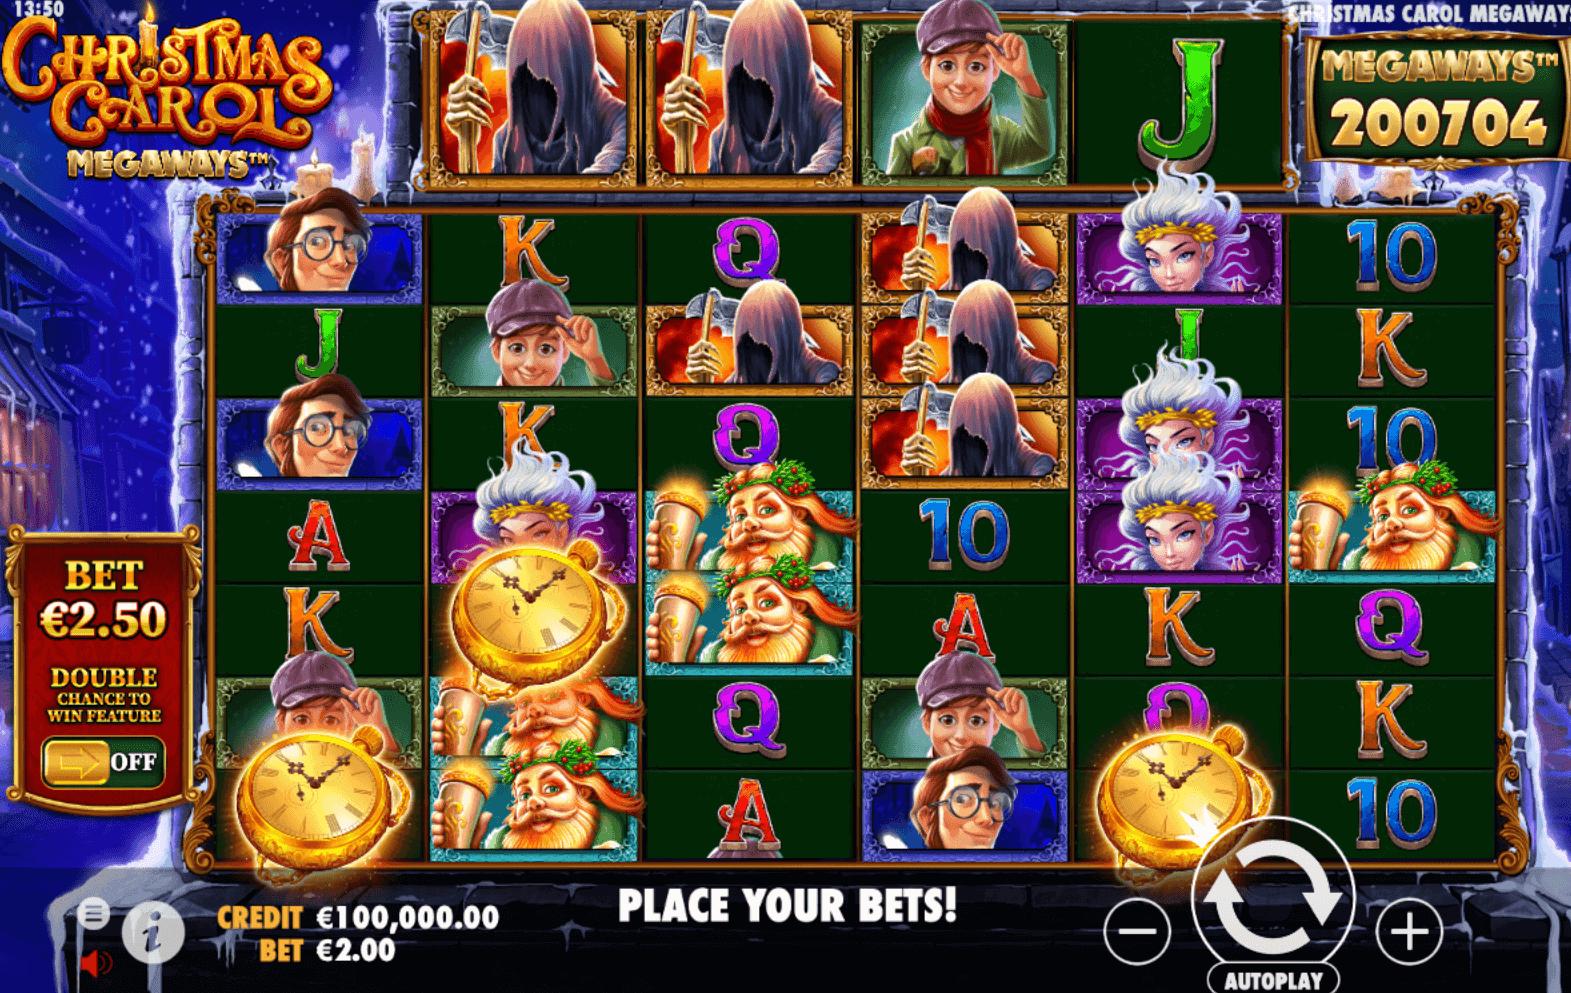 Screenshot from Christmas Carol Megaways Pragmatic Play slot